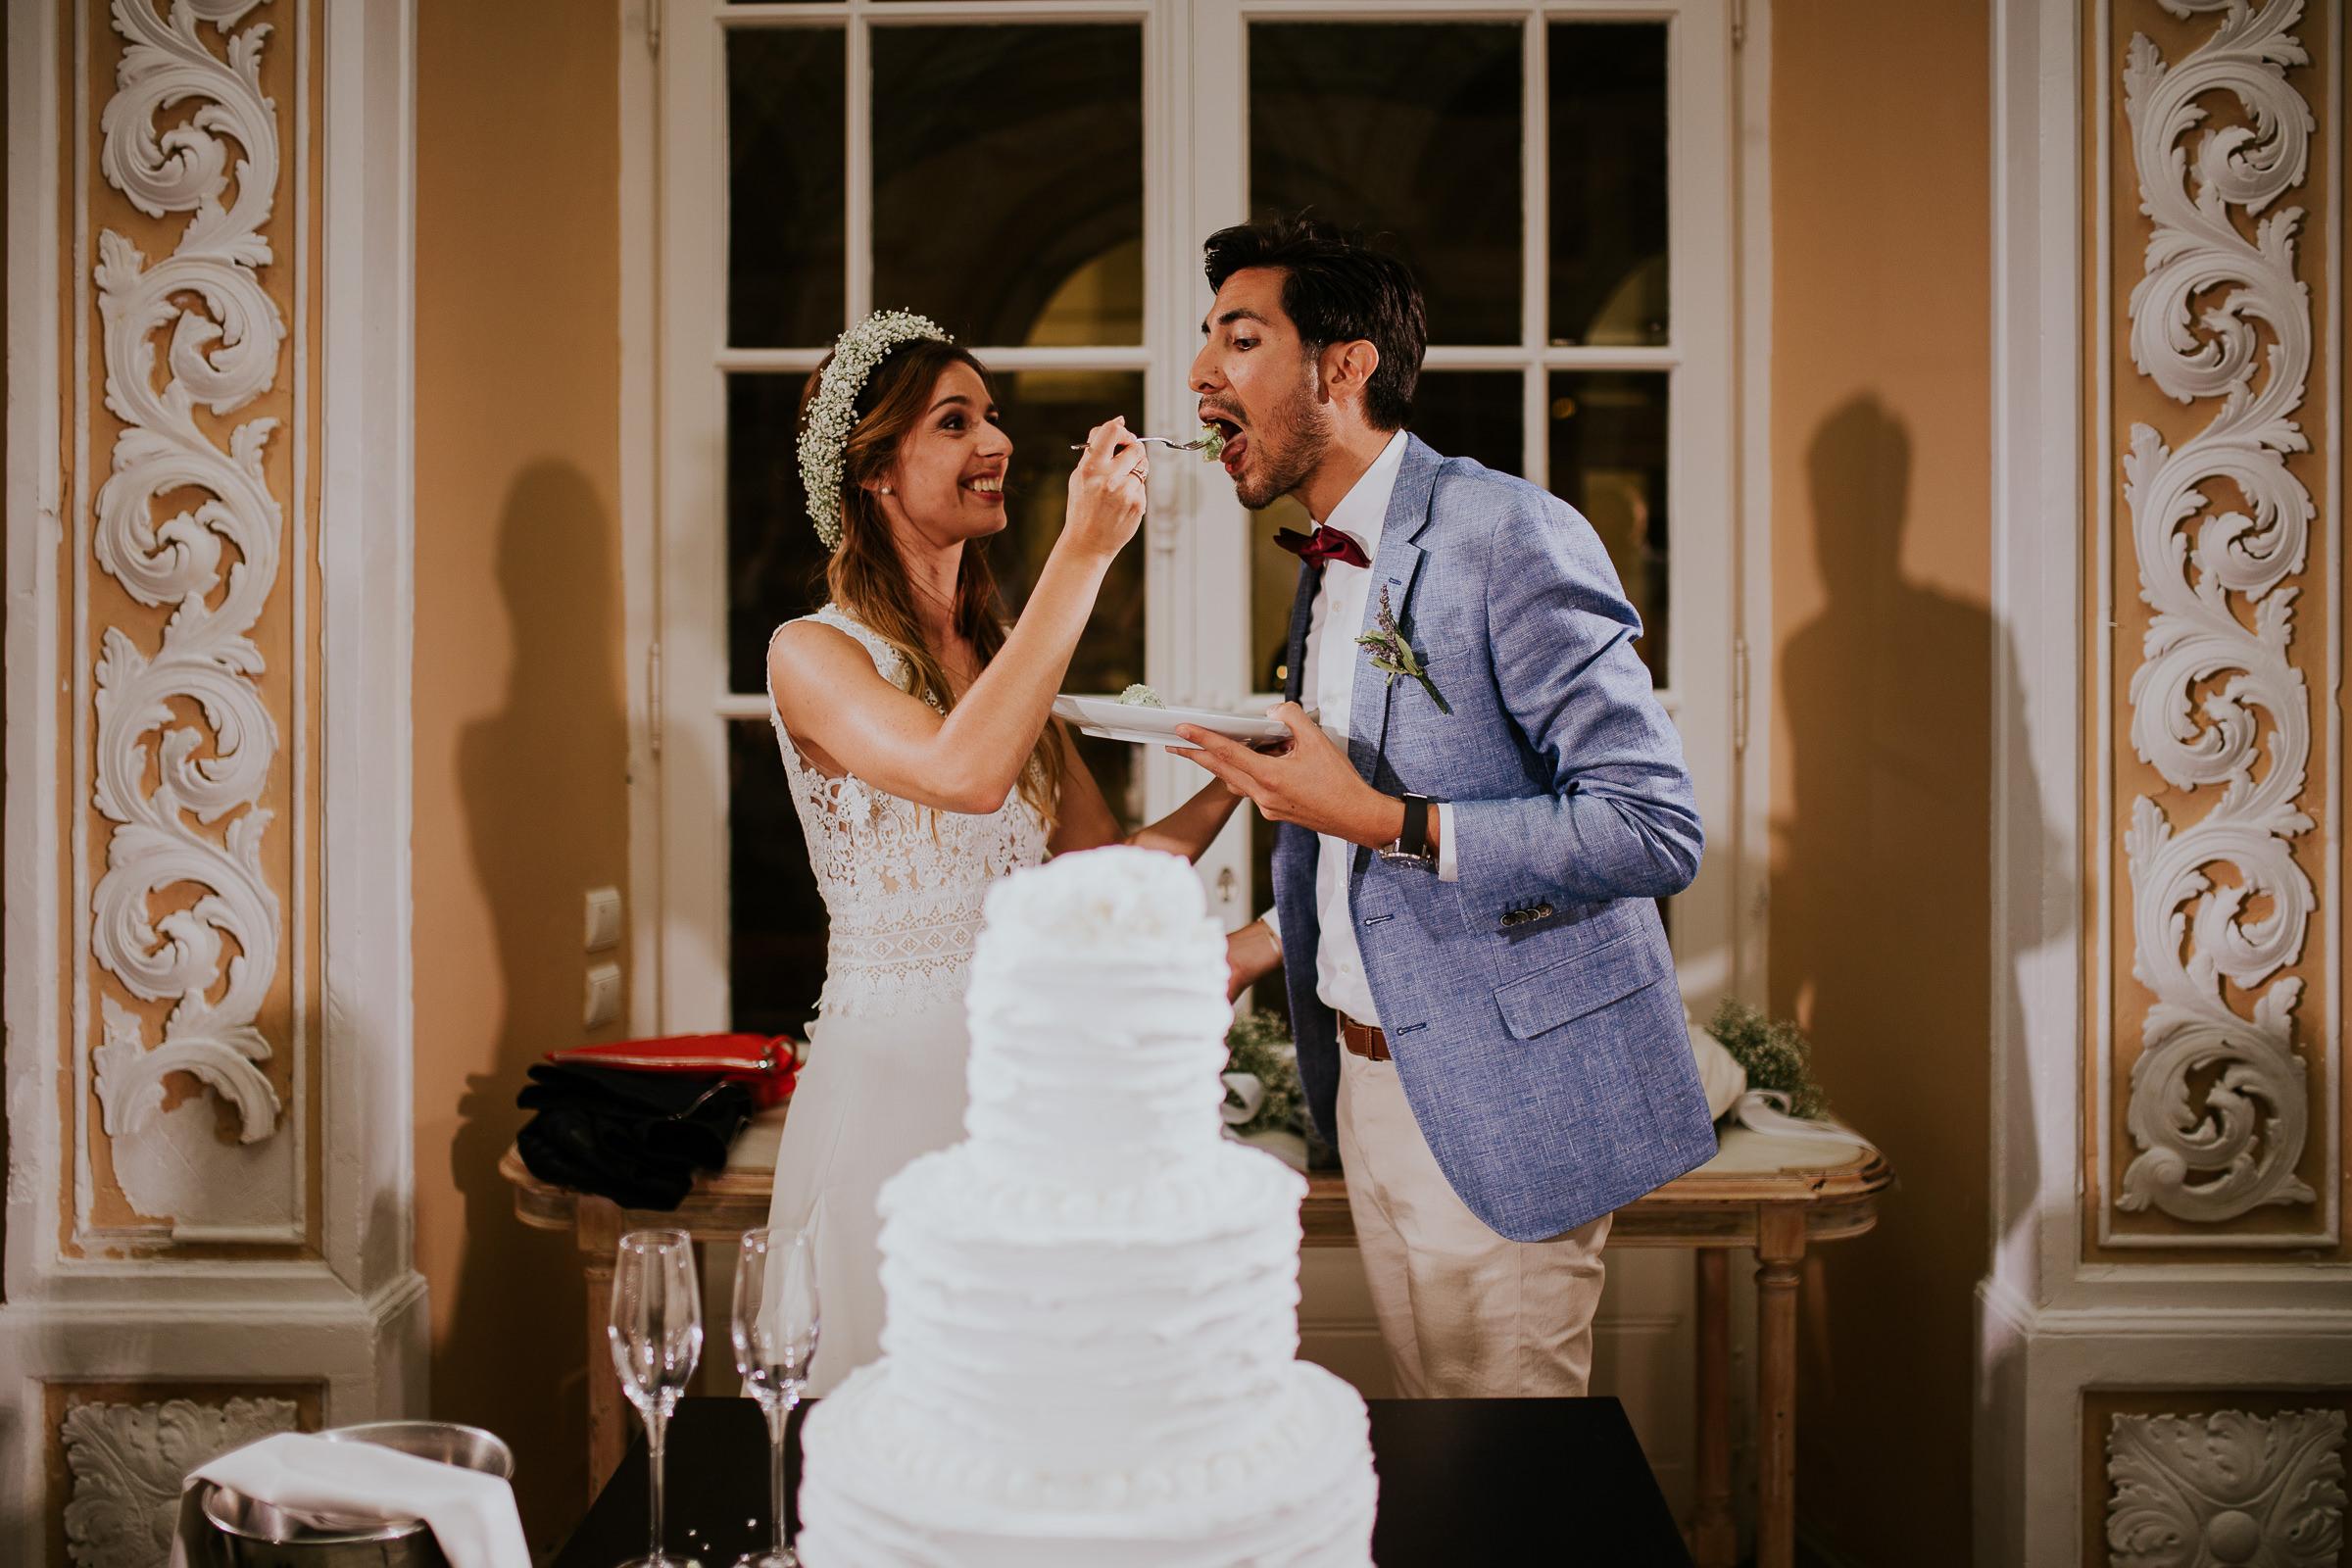 Funny bride feeding his groom with a piece od wedding cake